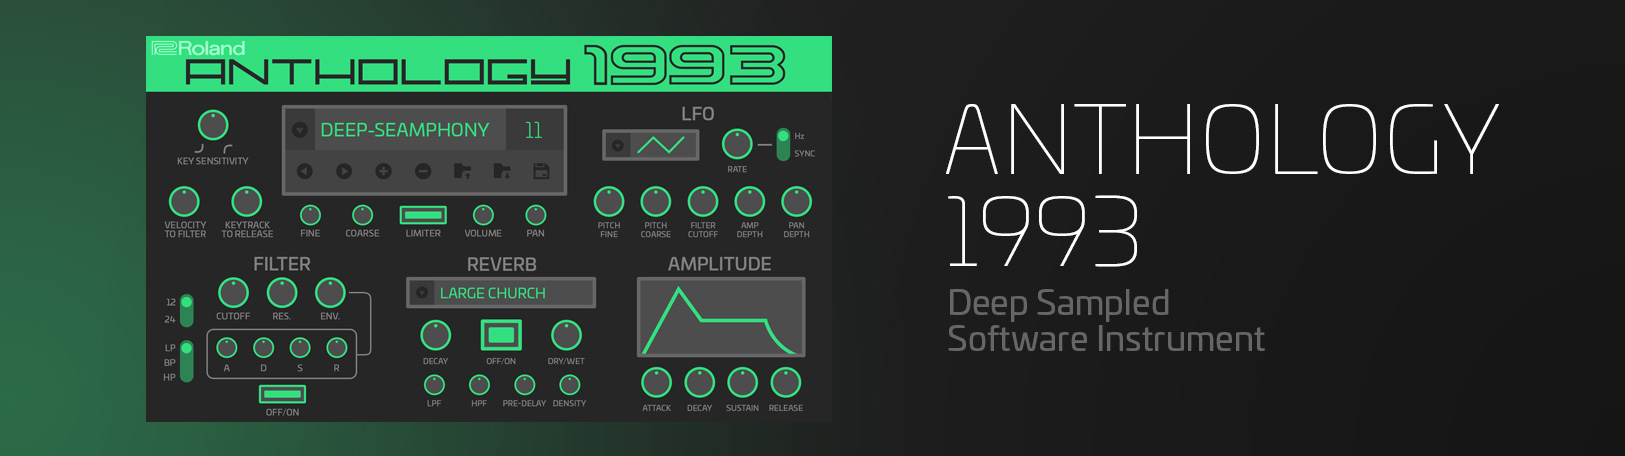 Anthology 1993: Virtual Synth Software - VST Plugin | Roland